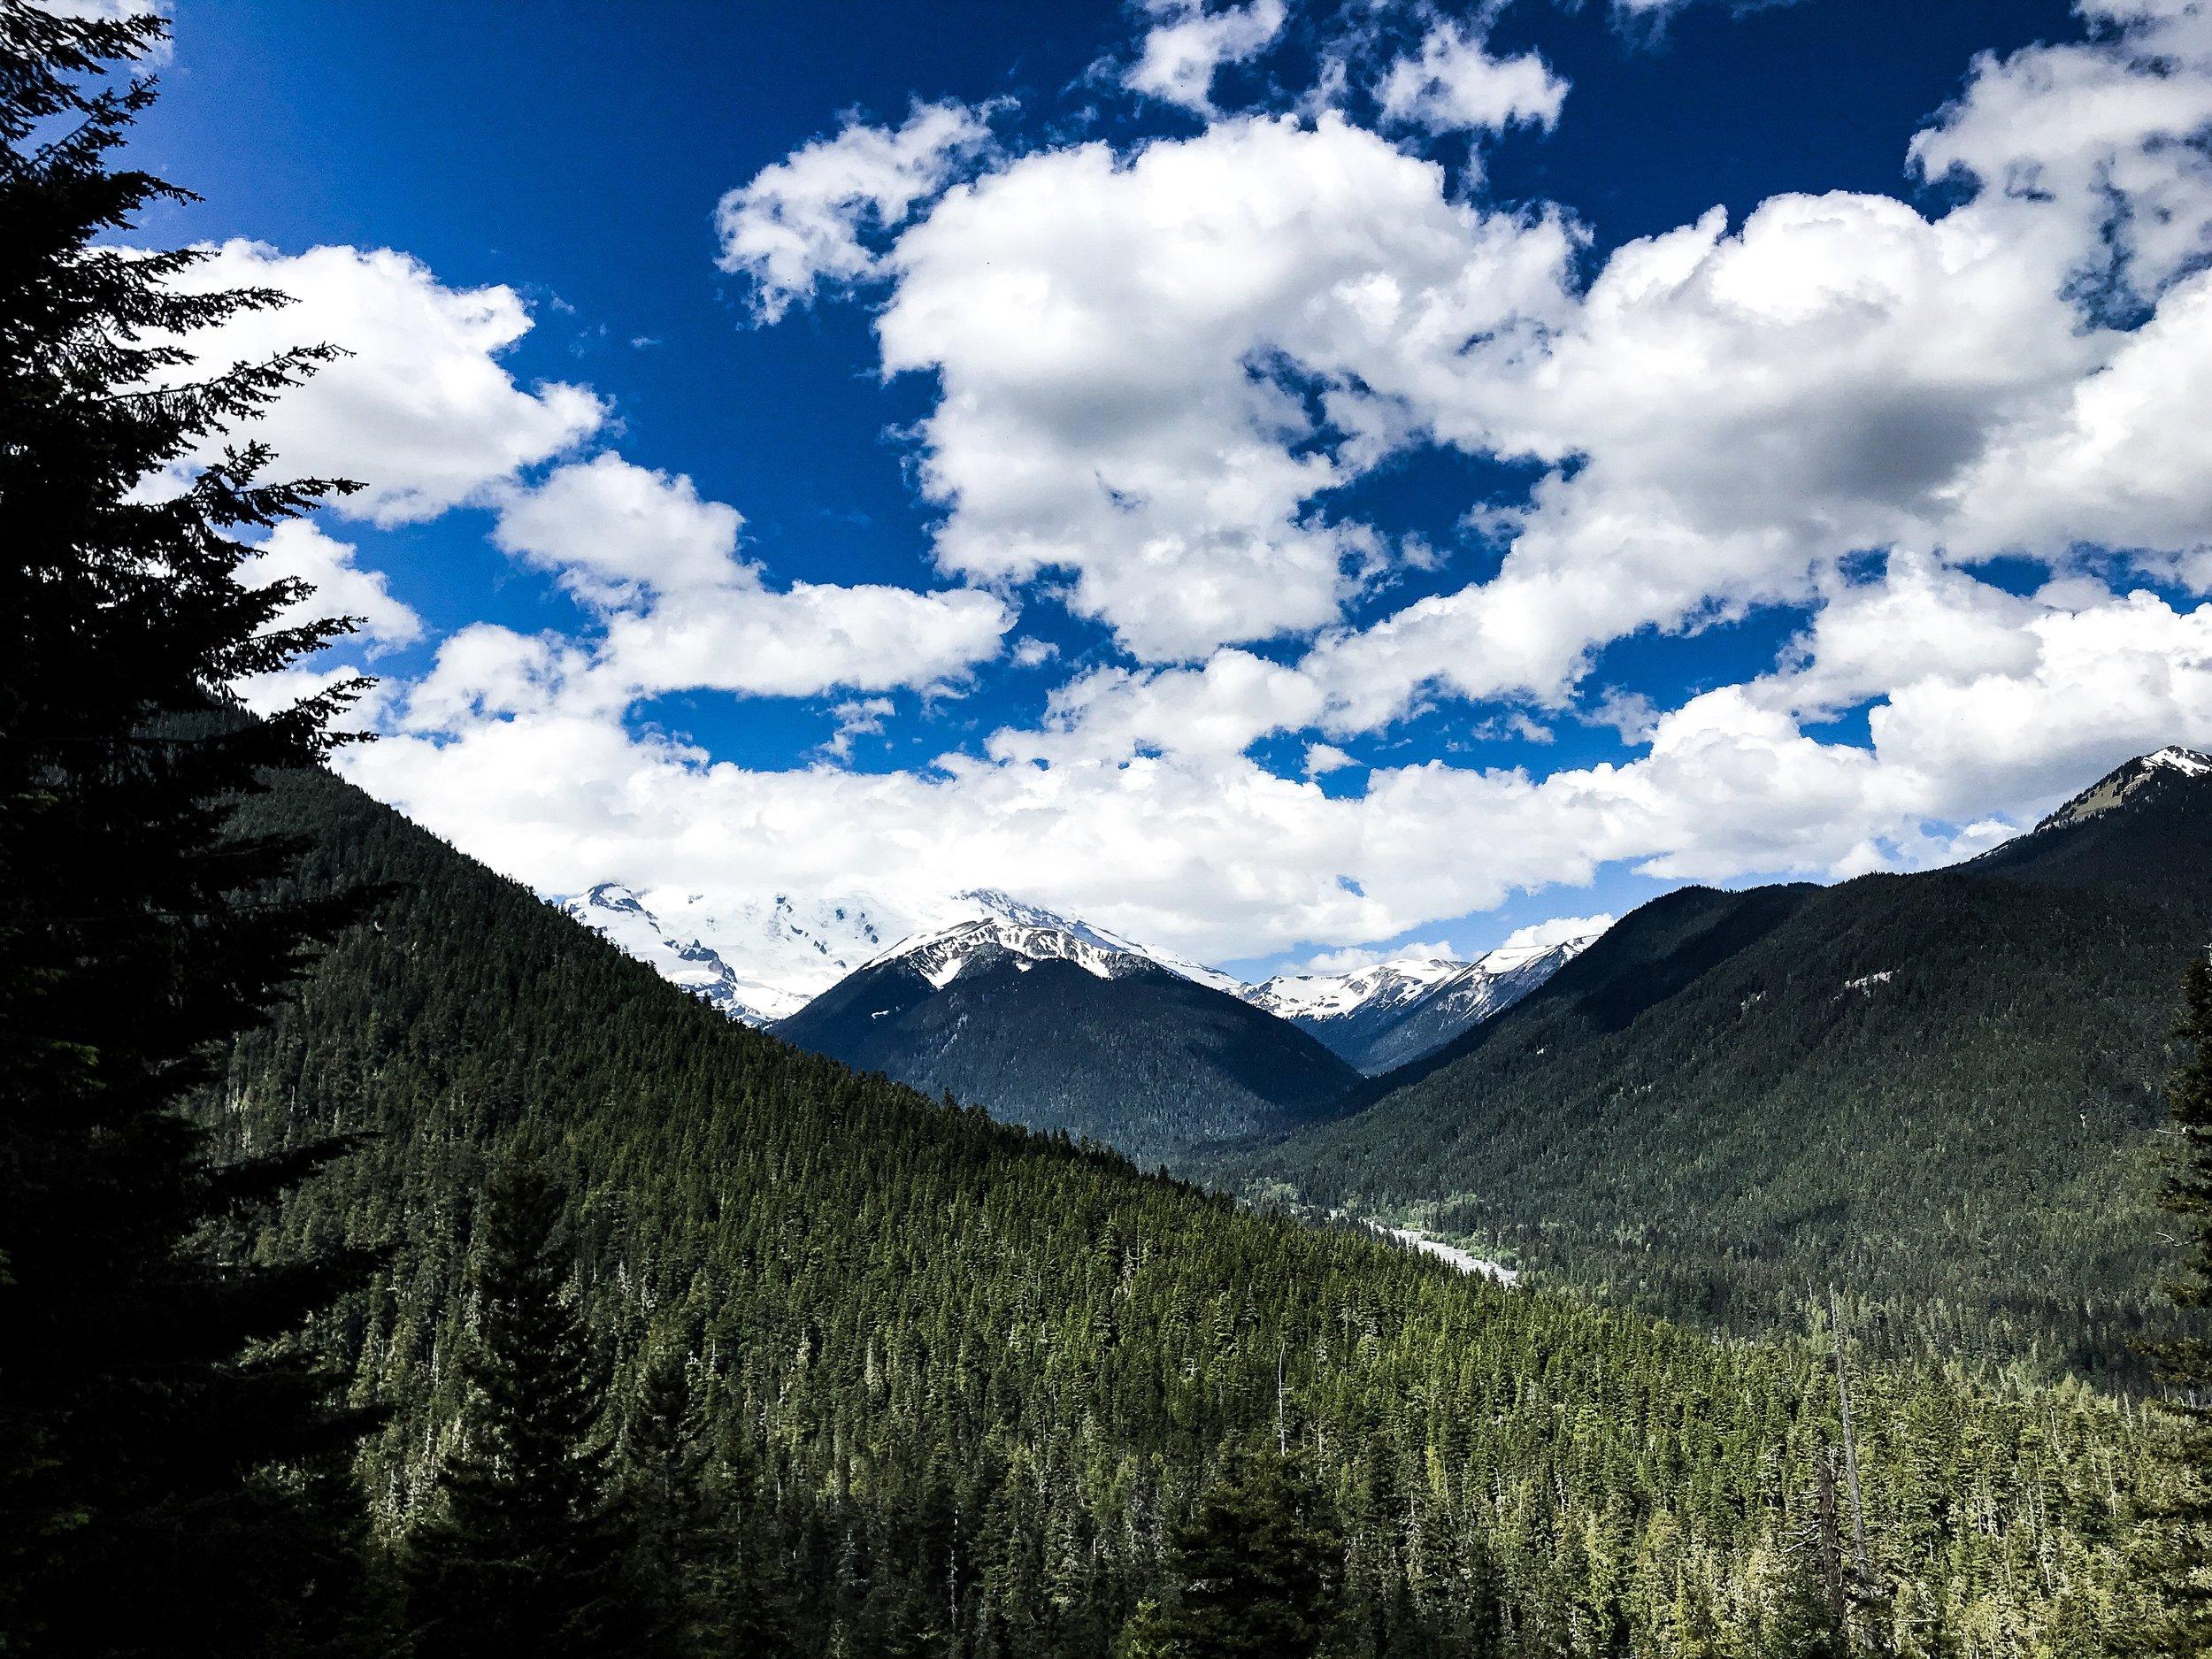 View of Mount Rainier from WA-7